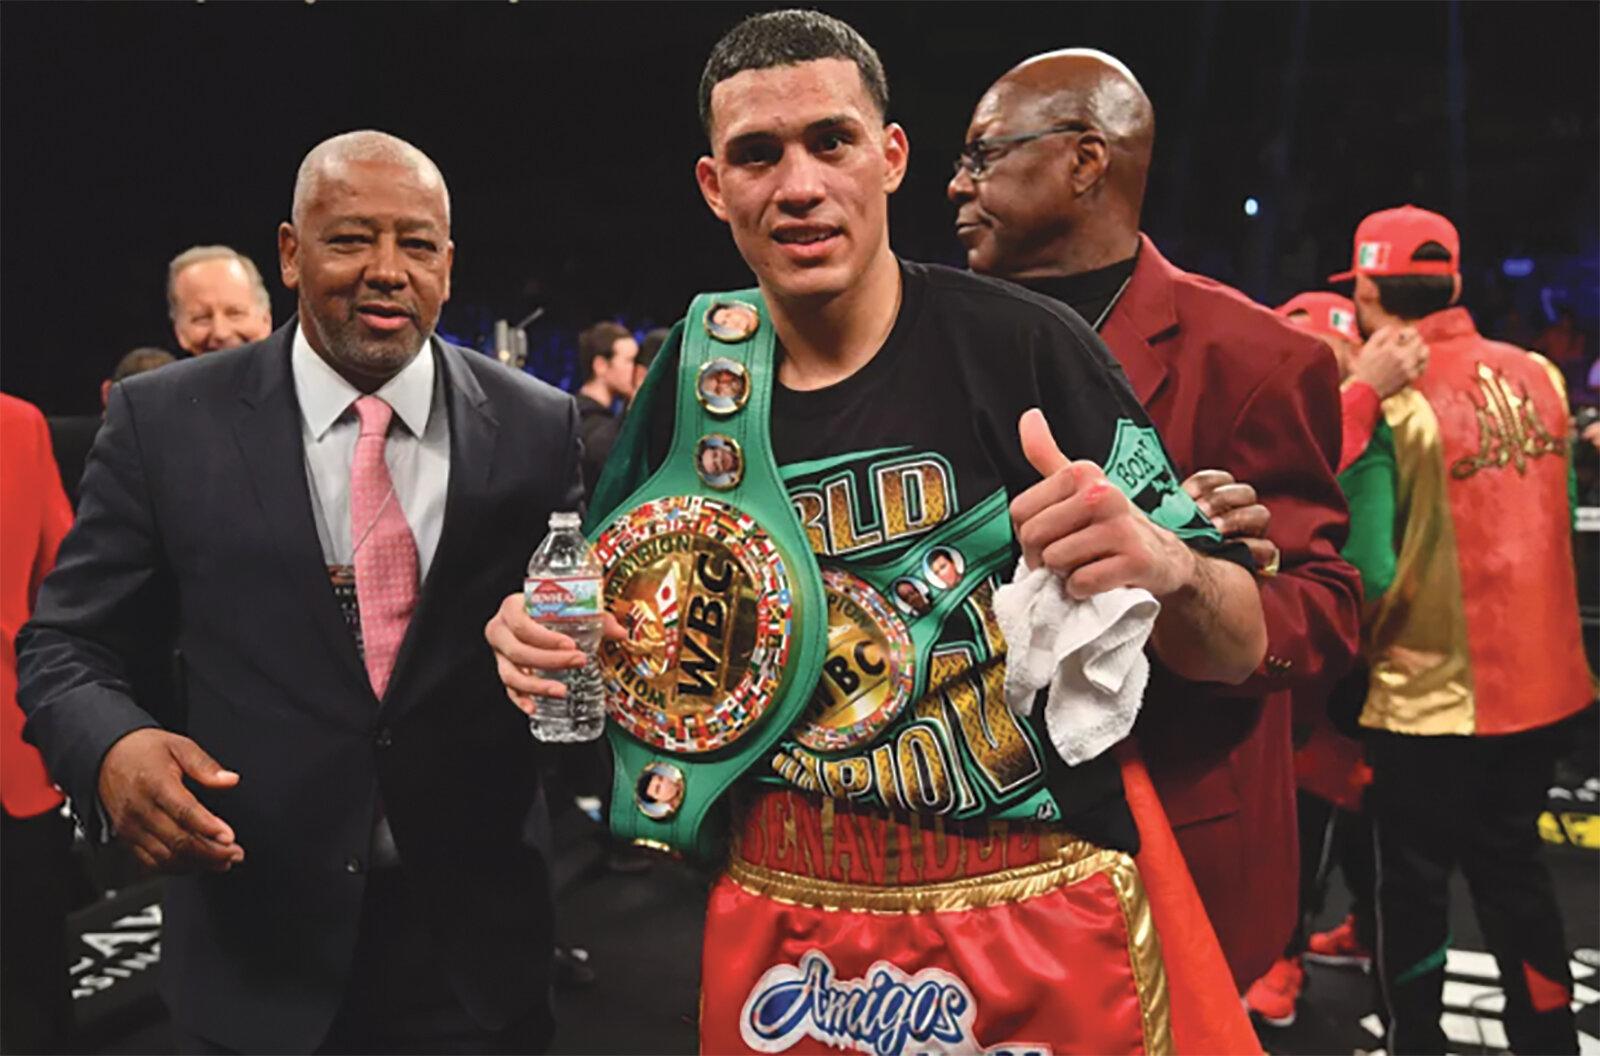 David Benavidez (right) pictured with PBC Boxing Promotor Sam Watson. (Photo Credit: Joe Camporeale-USA TODAY Sports)